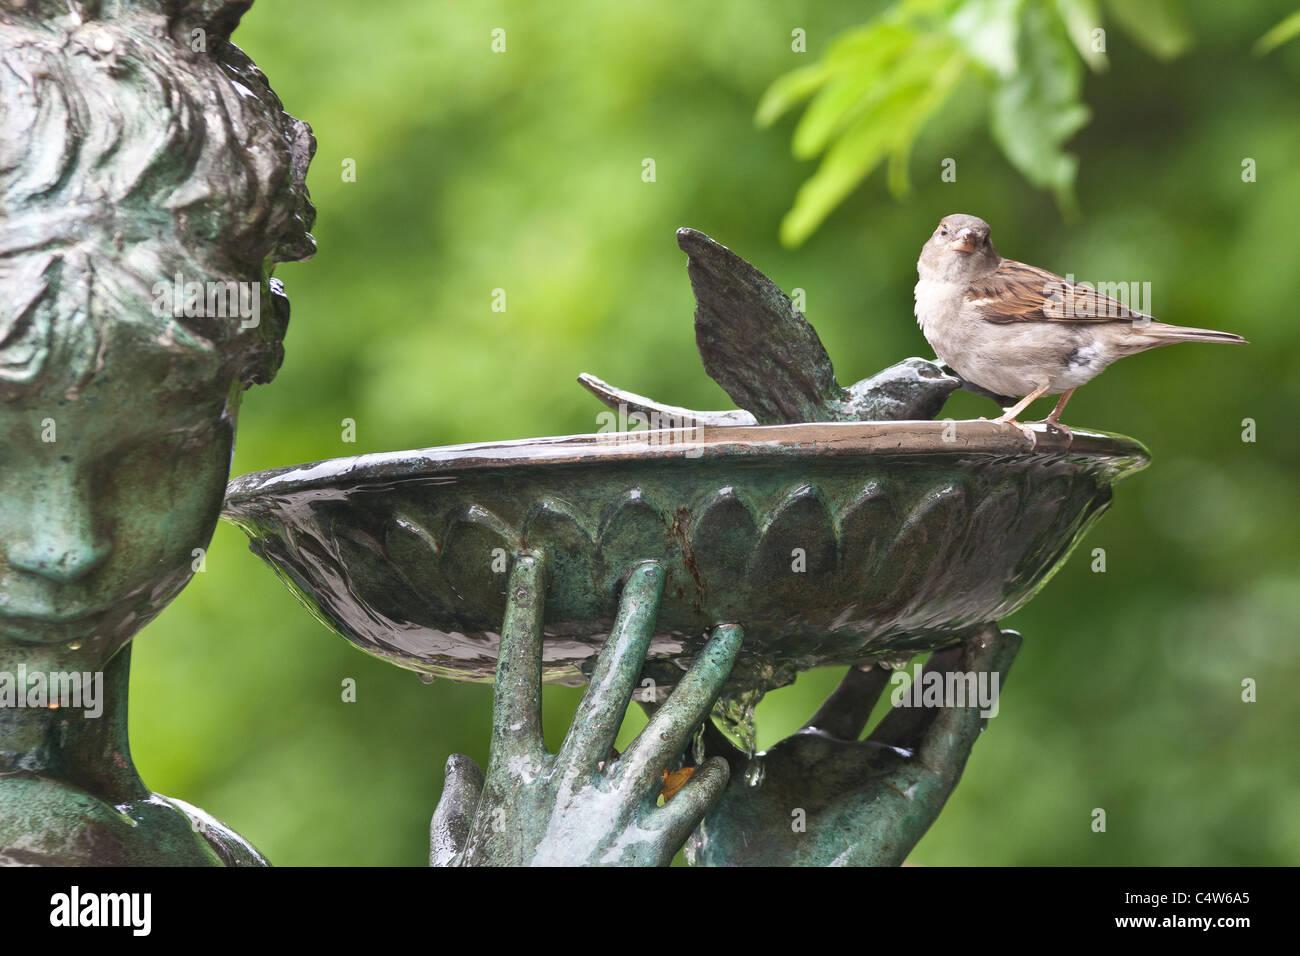 Sparrows Drinking Stockfotos & Sparrows Drinking Bilder - Alamy